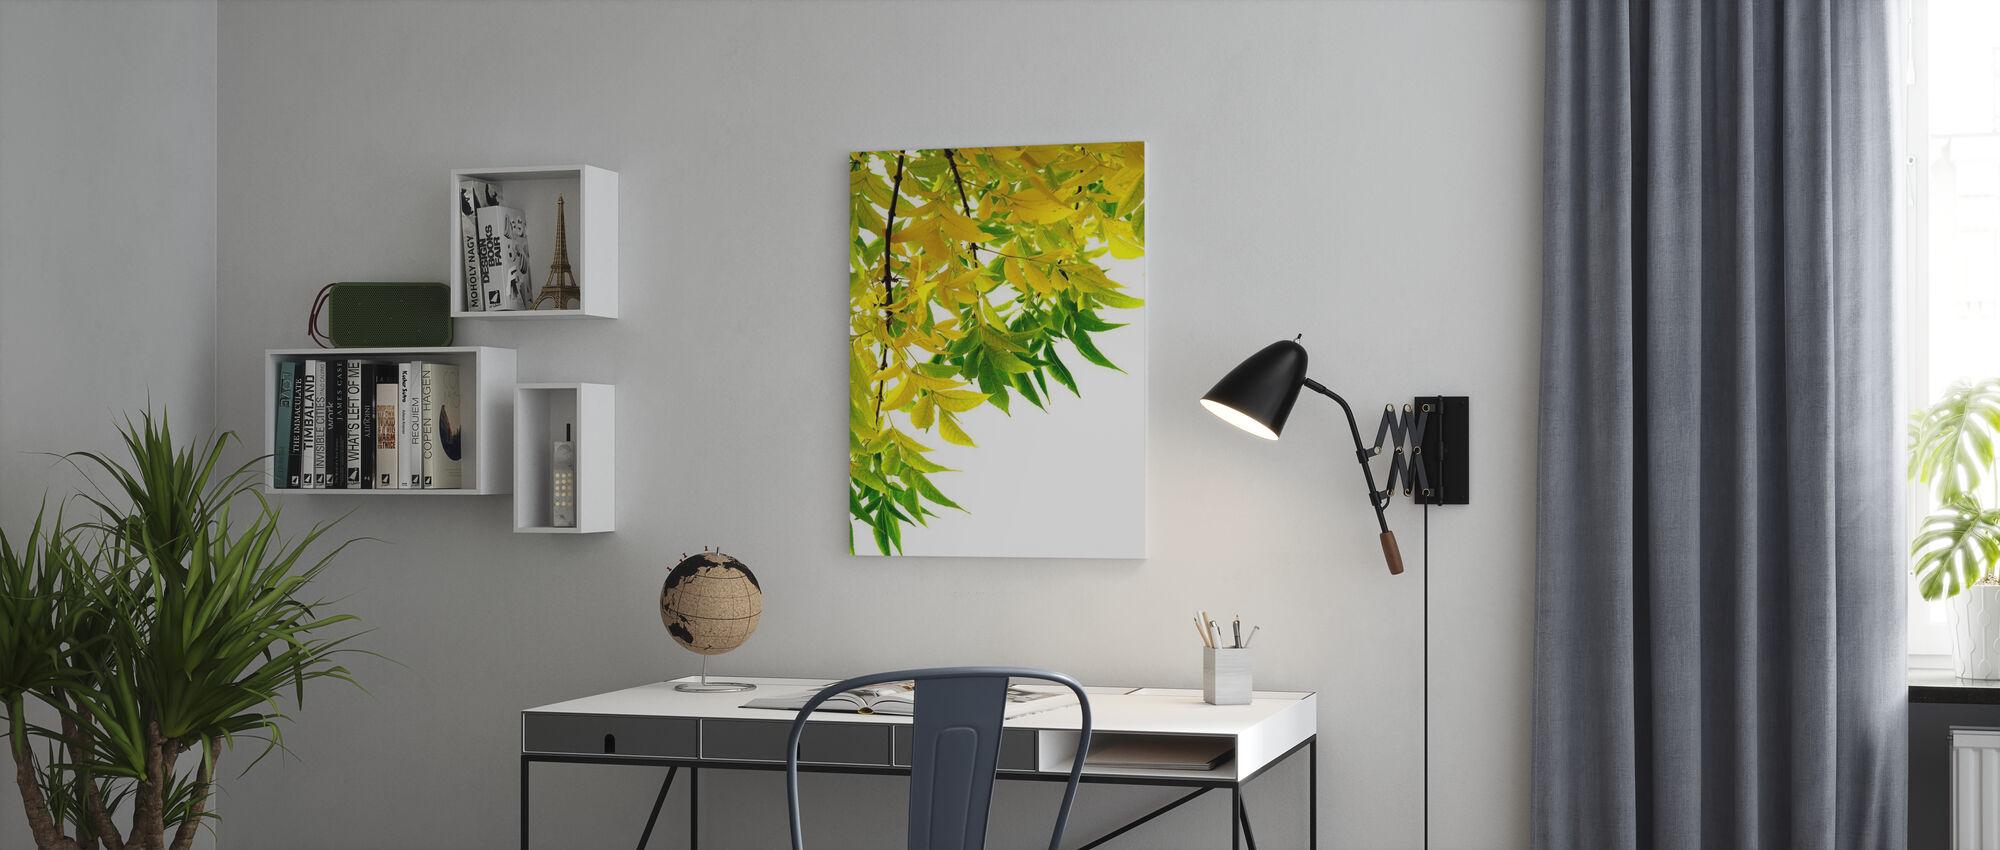 Groen en Geel Blad - Canvas print - Kantoor